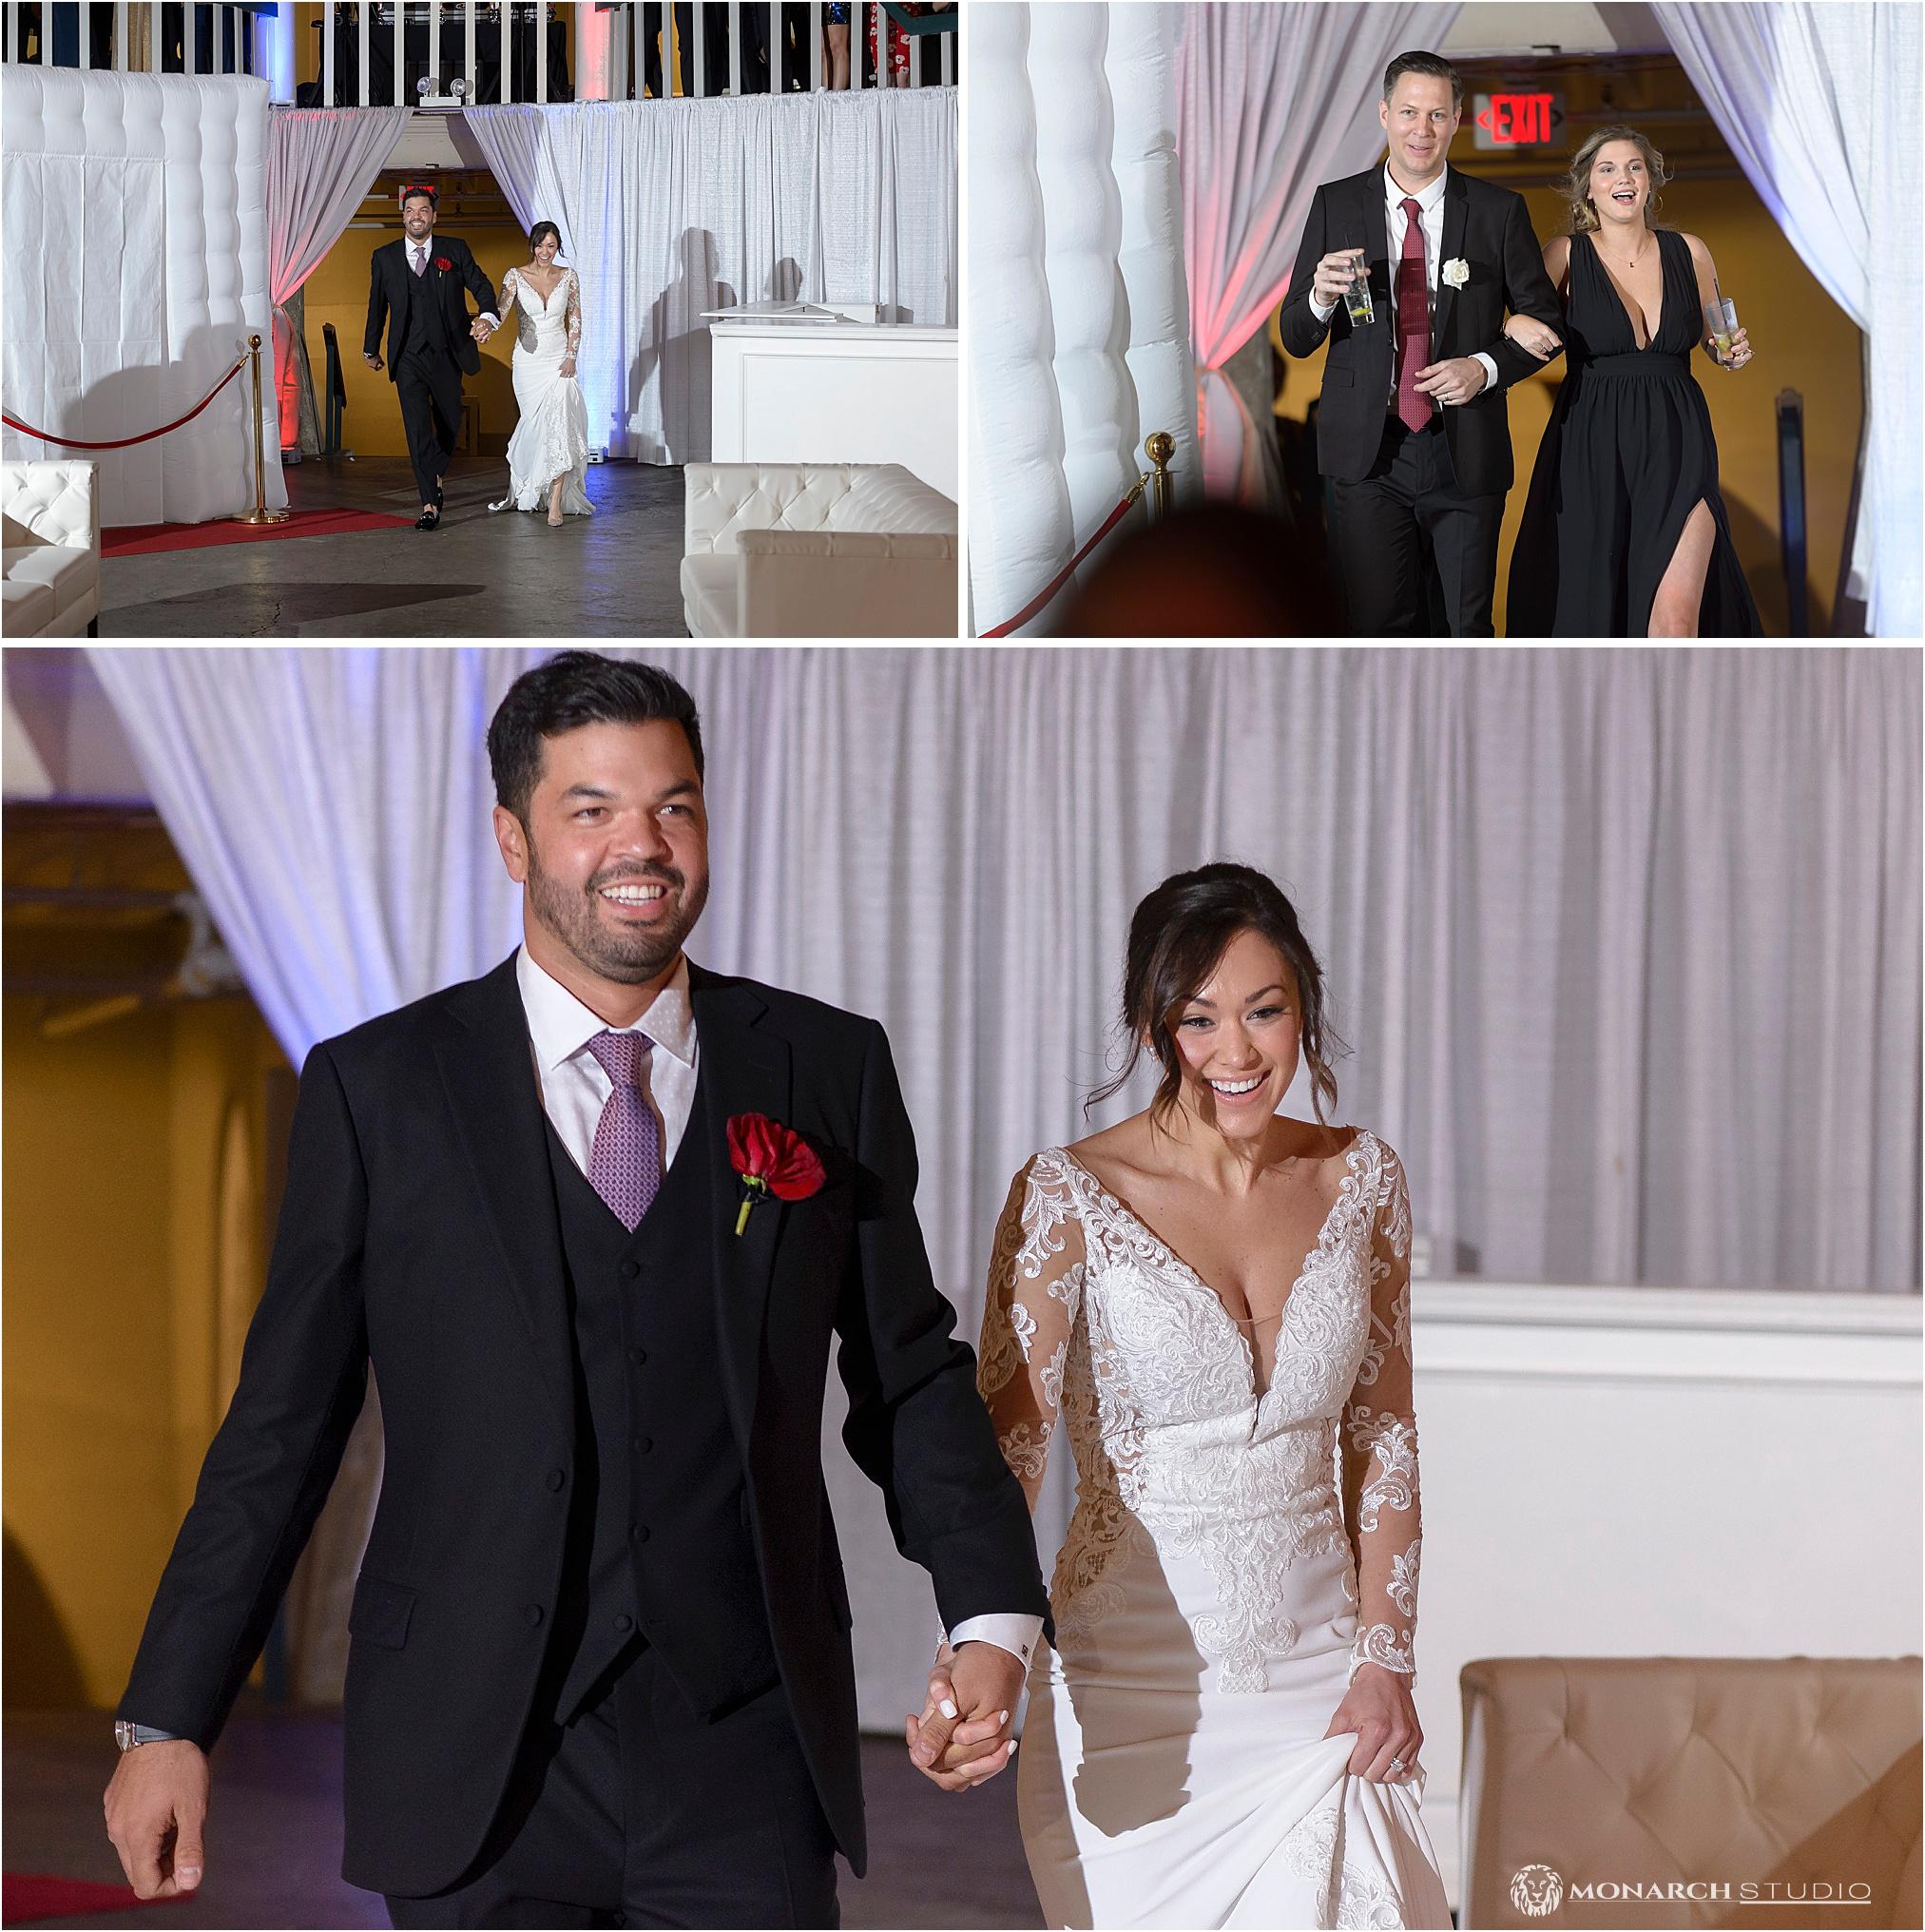 st-augustine-high-end-wedding-photographers-106.jpg